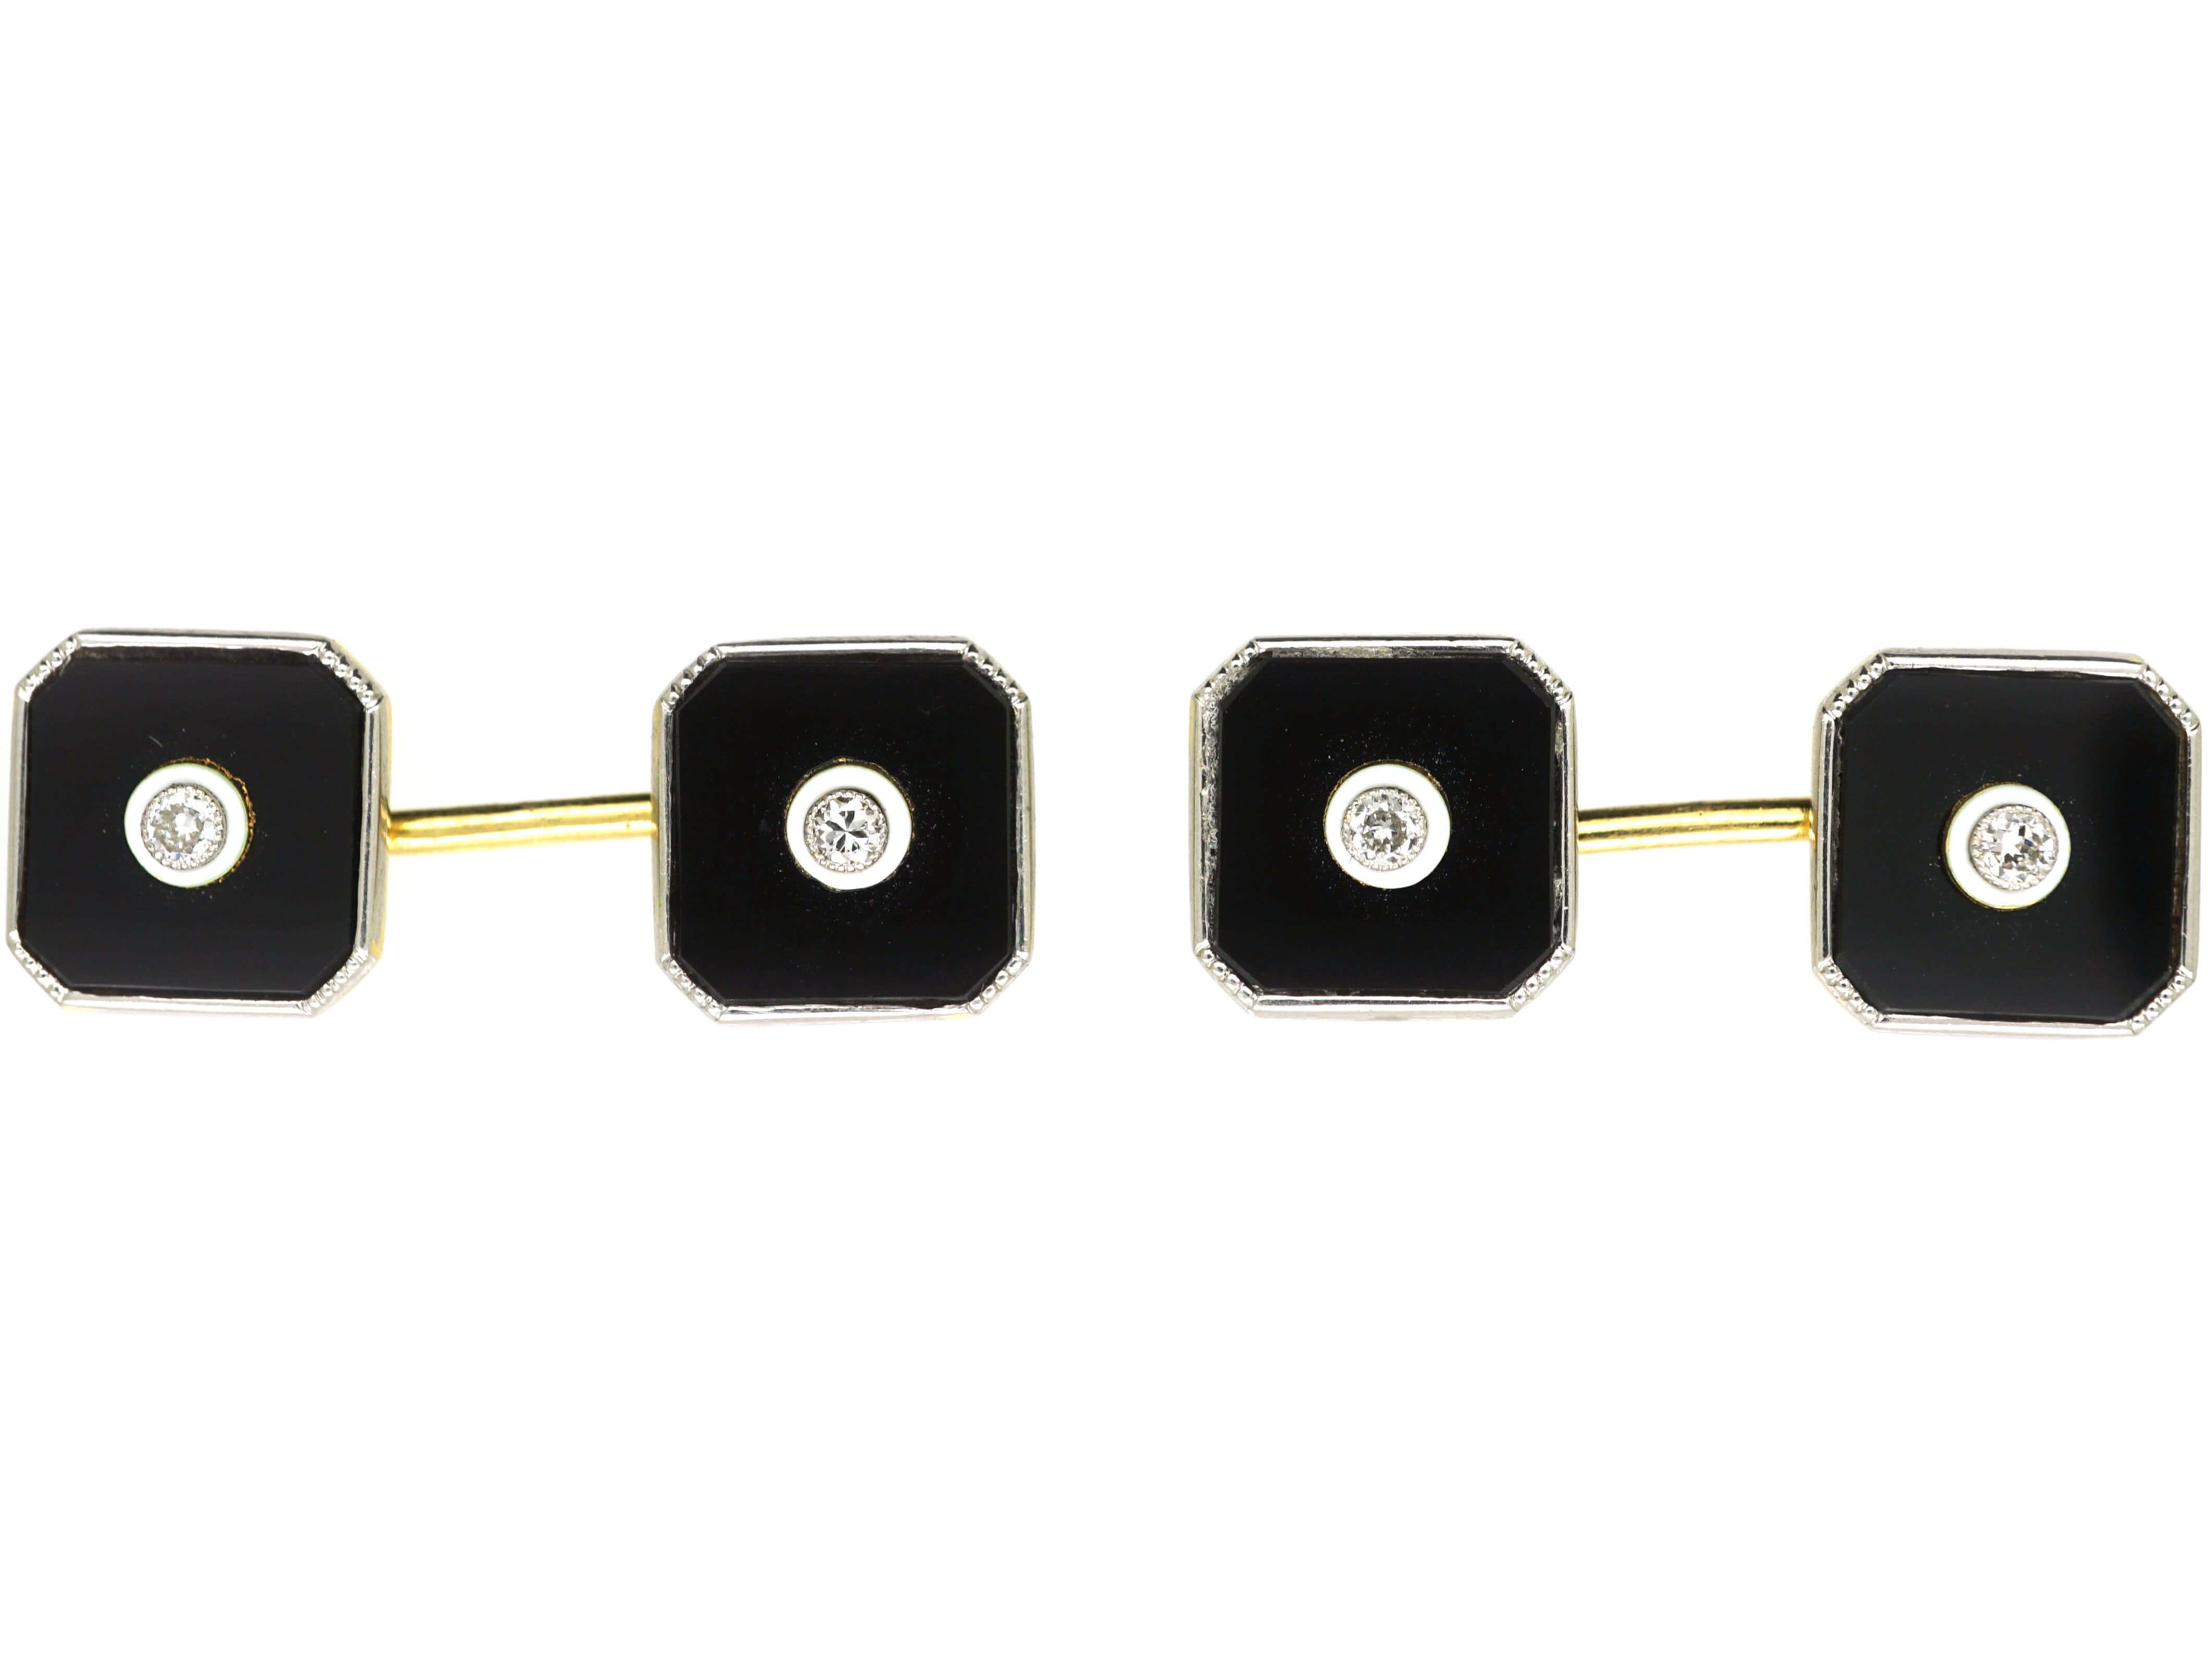 Art Deco 18ct Gold & Platinum, Onyx & Diamond Cufflinks